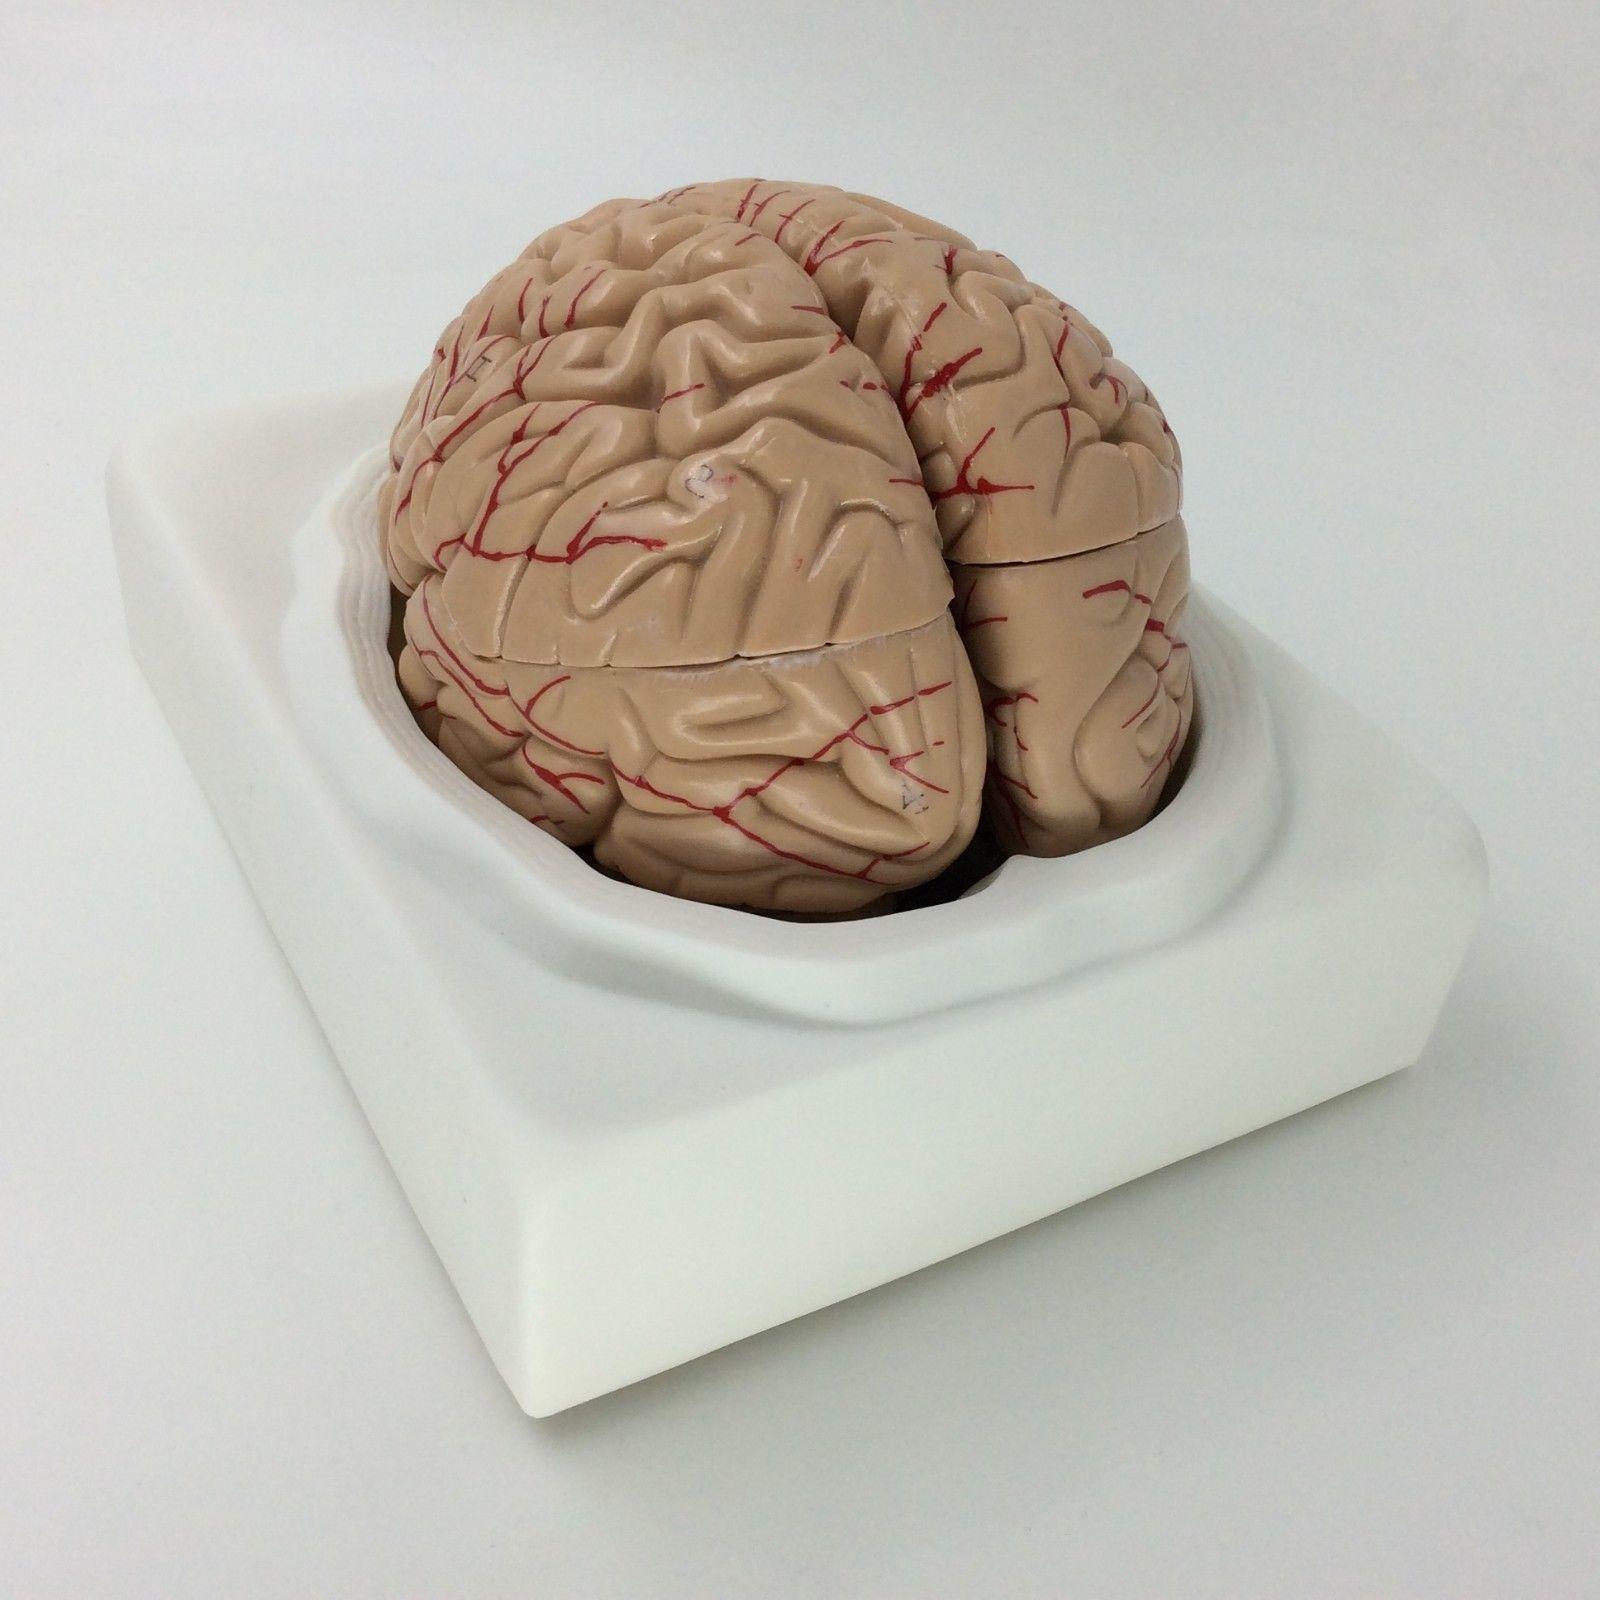 Life Size Human Brain model anatomical and similar items